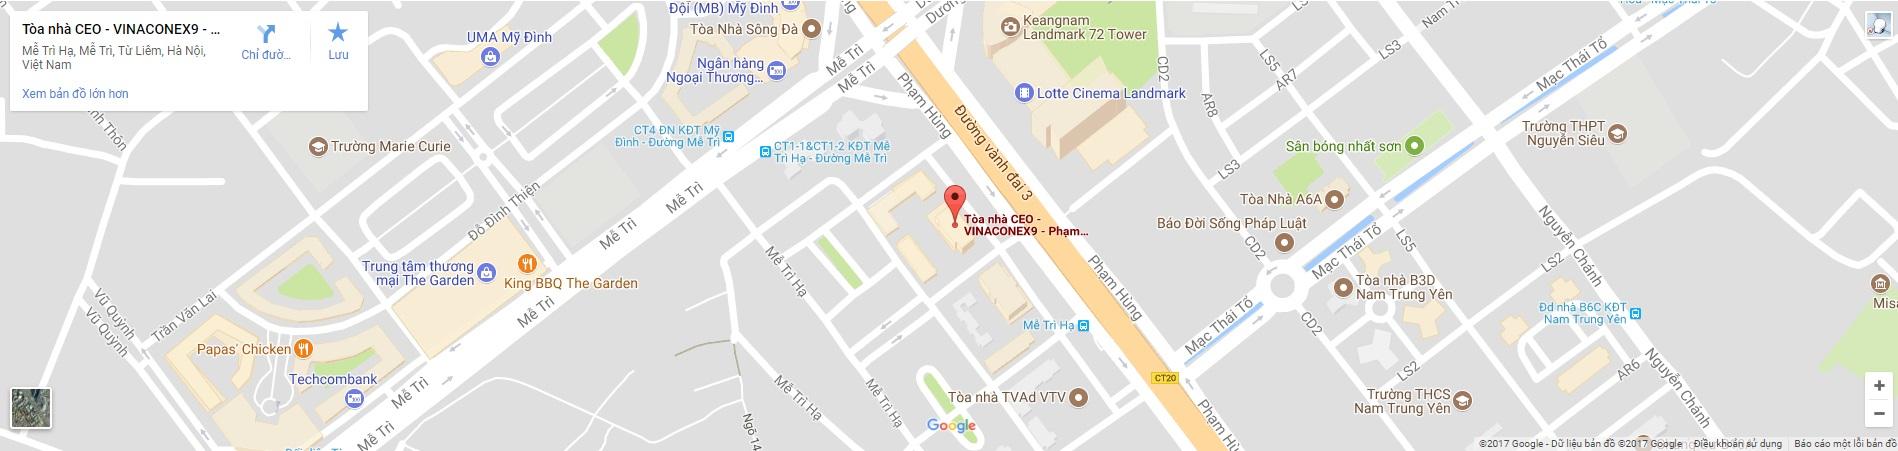 visana address map